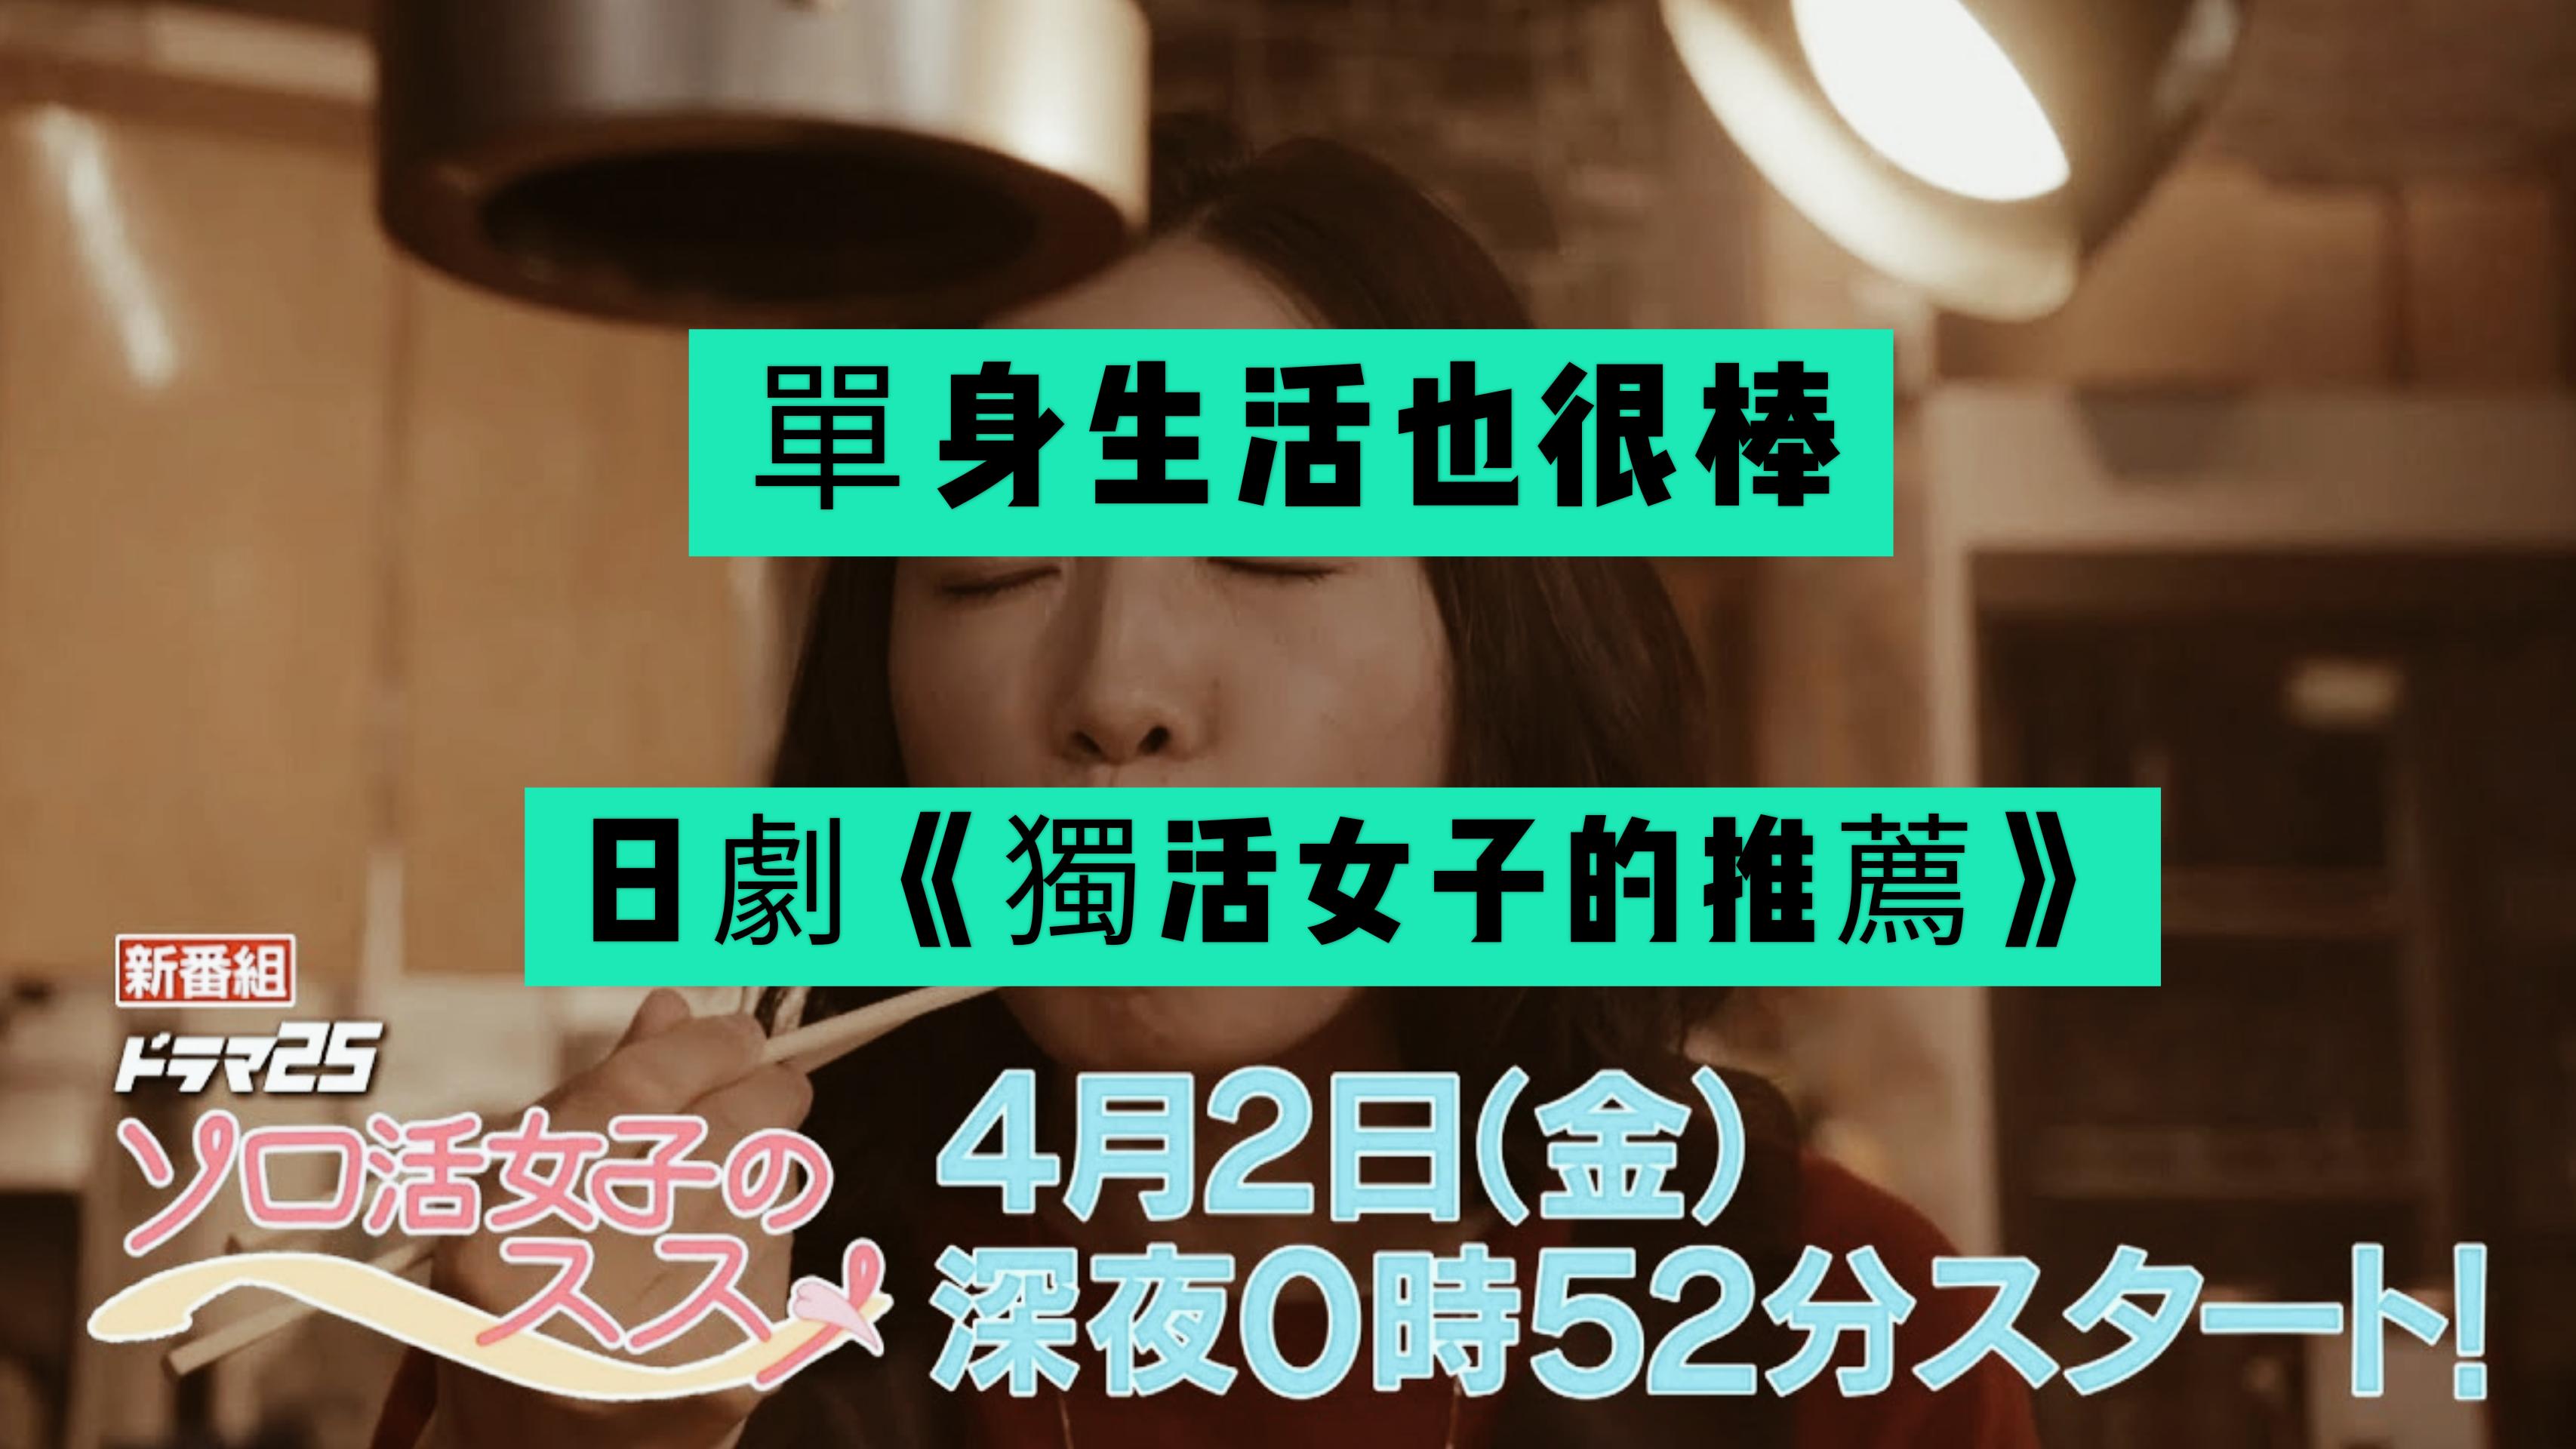 ep.44 一個人也很好 | 日劇《獨活女子的推薦》 | 少子化、低生育、不結婚 | 超單身時代的來臨 // 李長潔